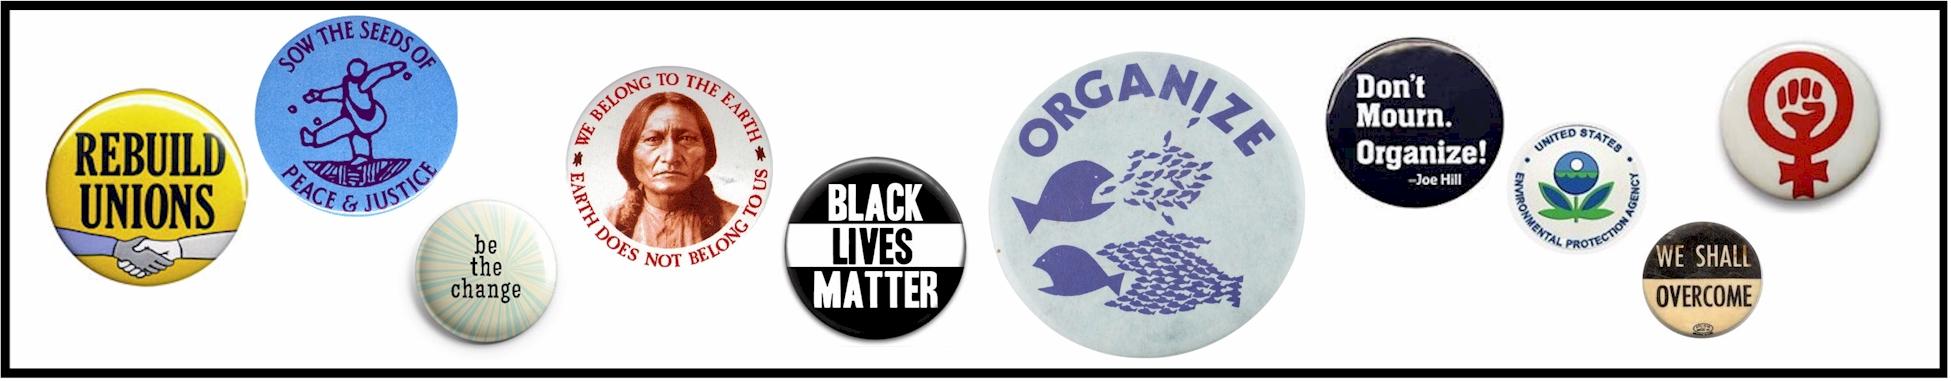 Activist buttons